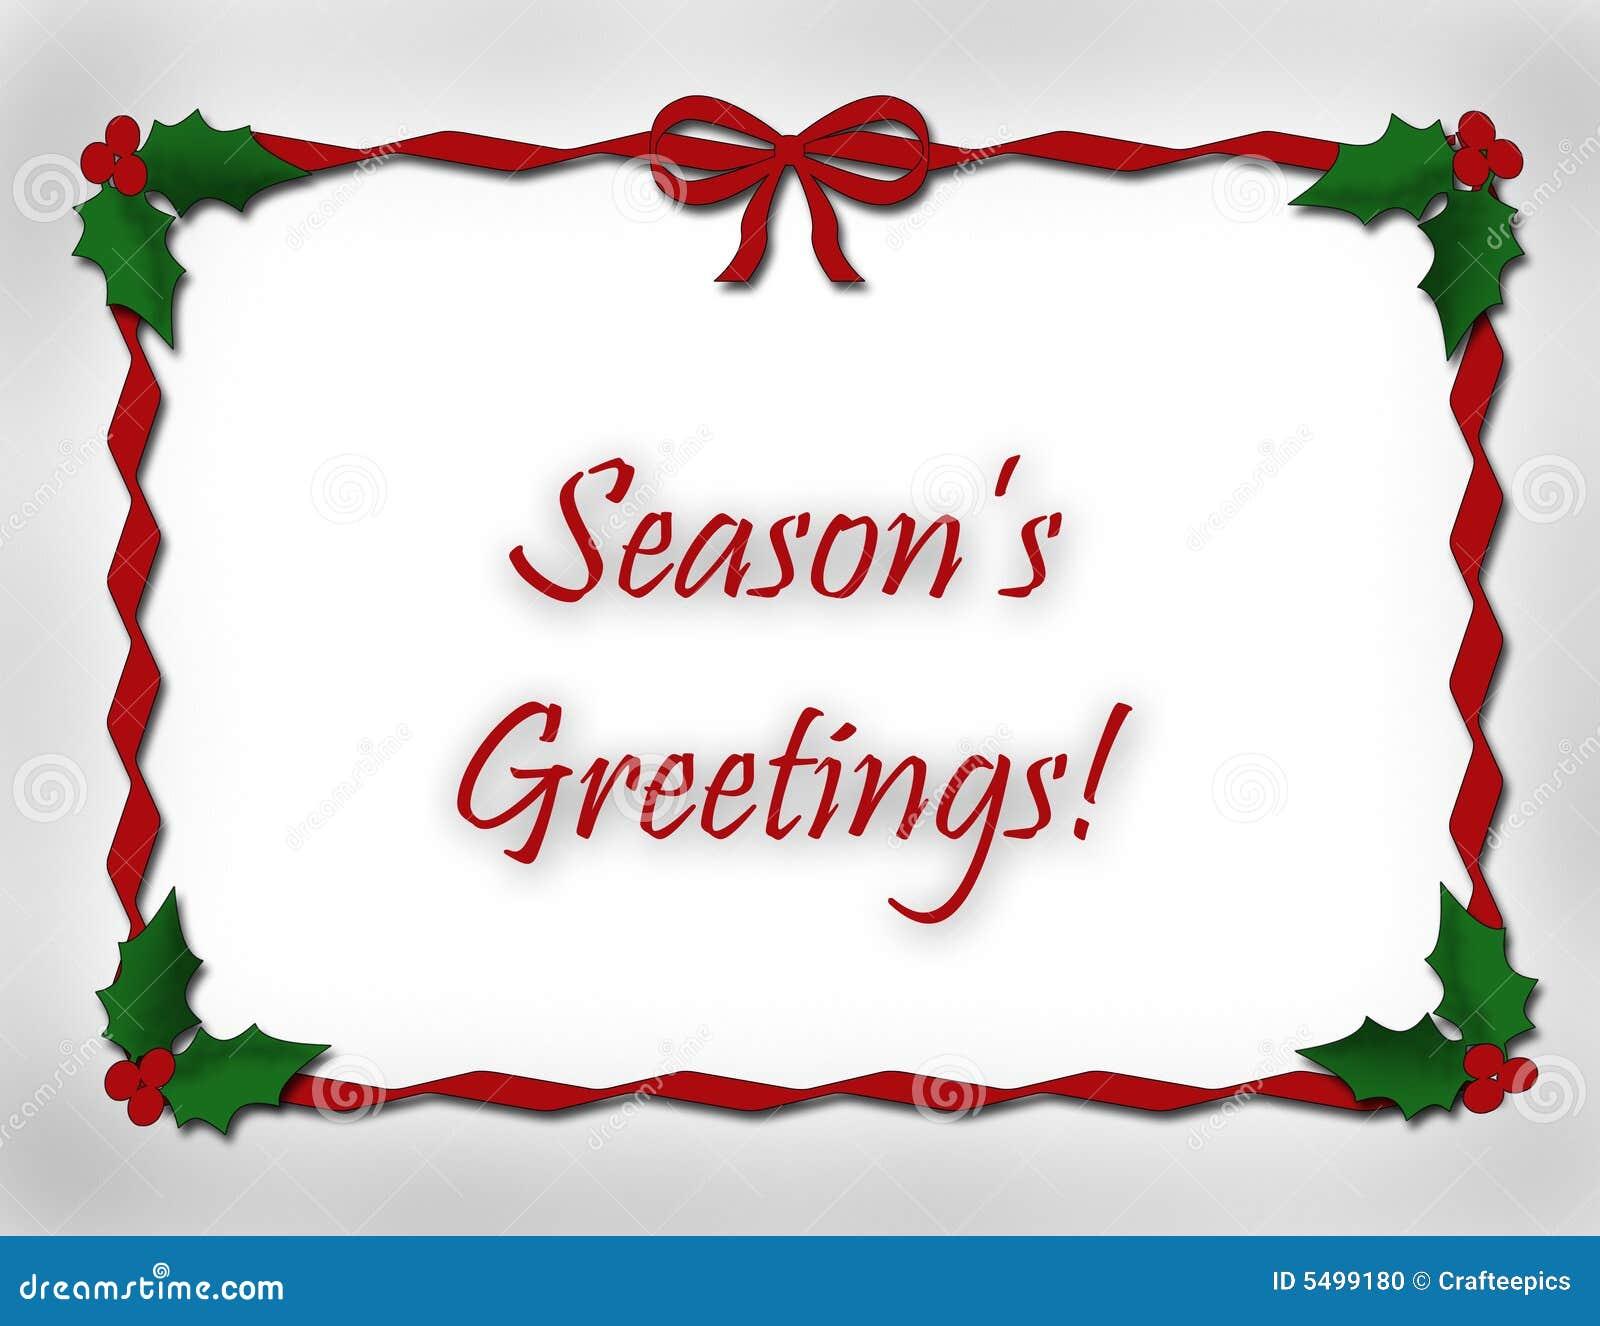 Season S Greetings Cards Zrom